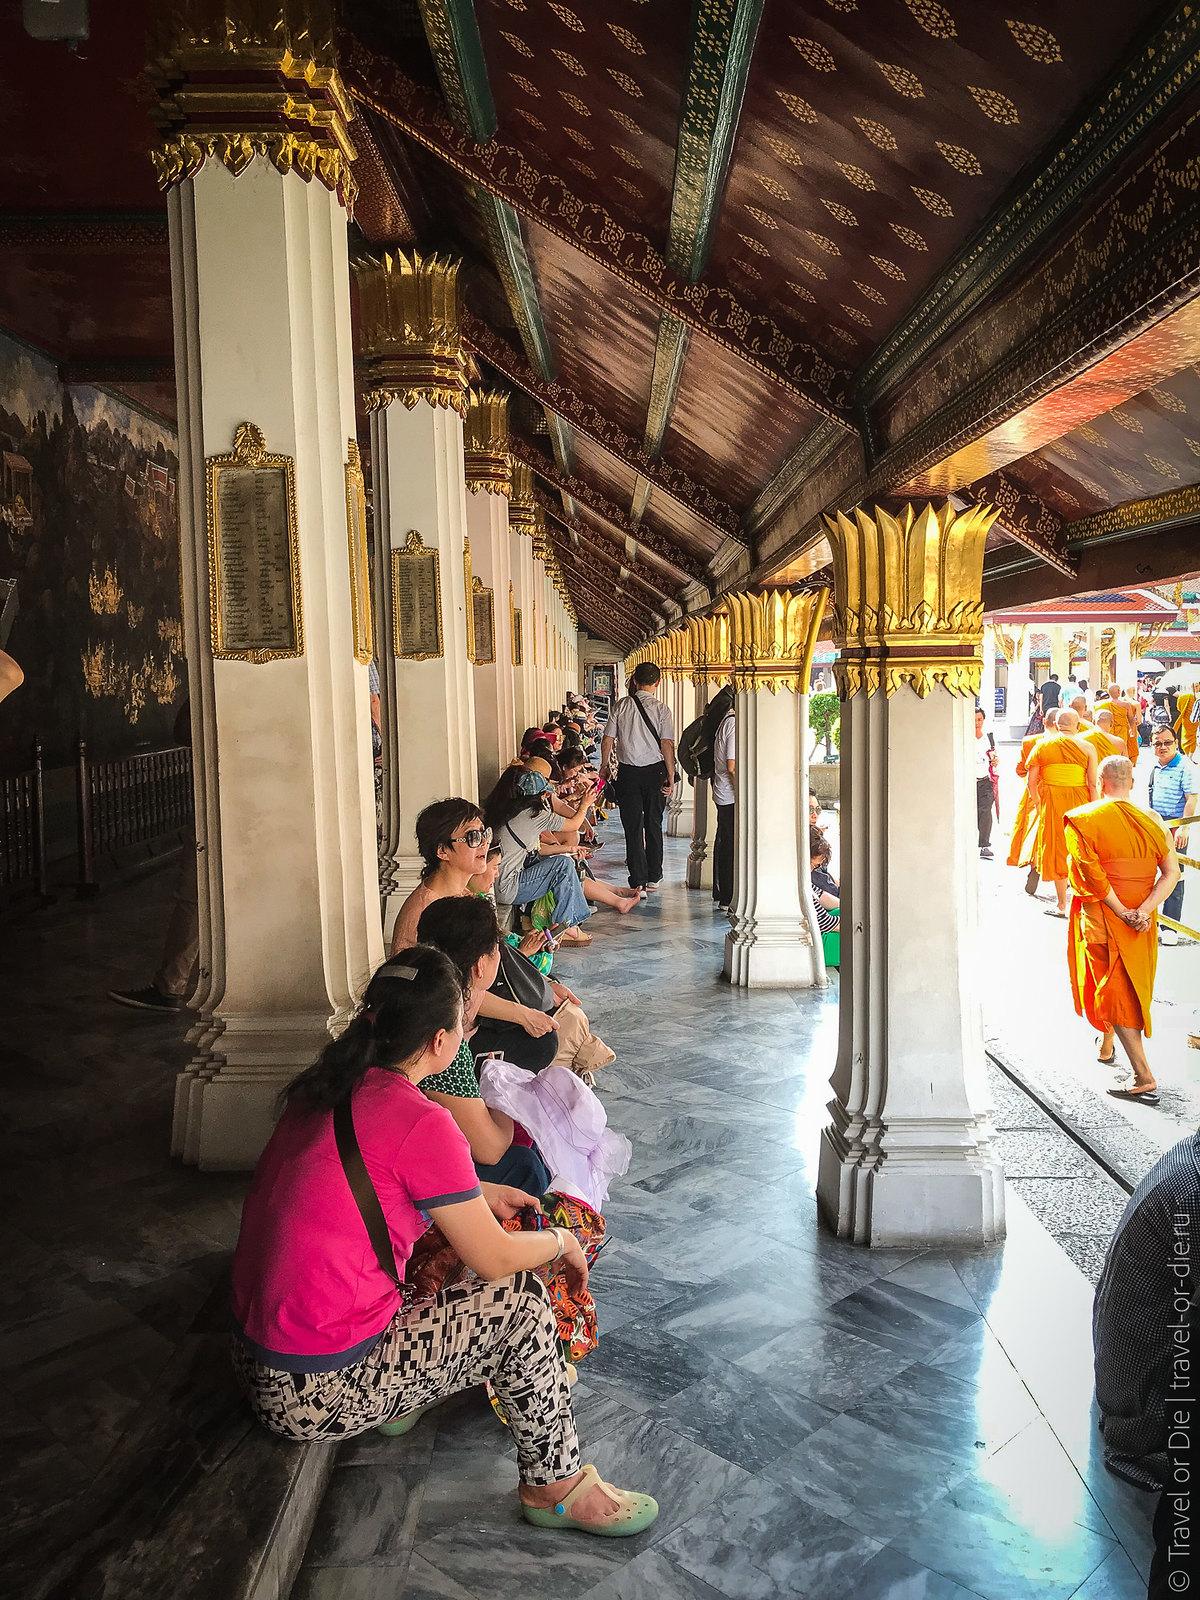 Grand-Palace-Bangkok-Королевский-дворец-Бангкок-9196